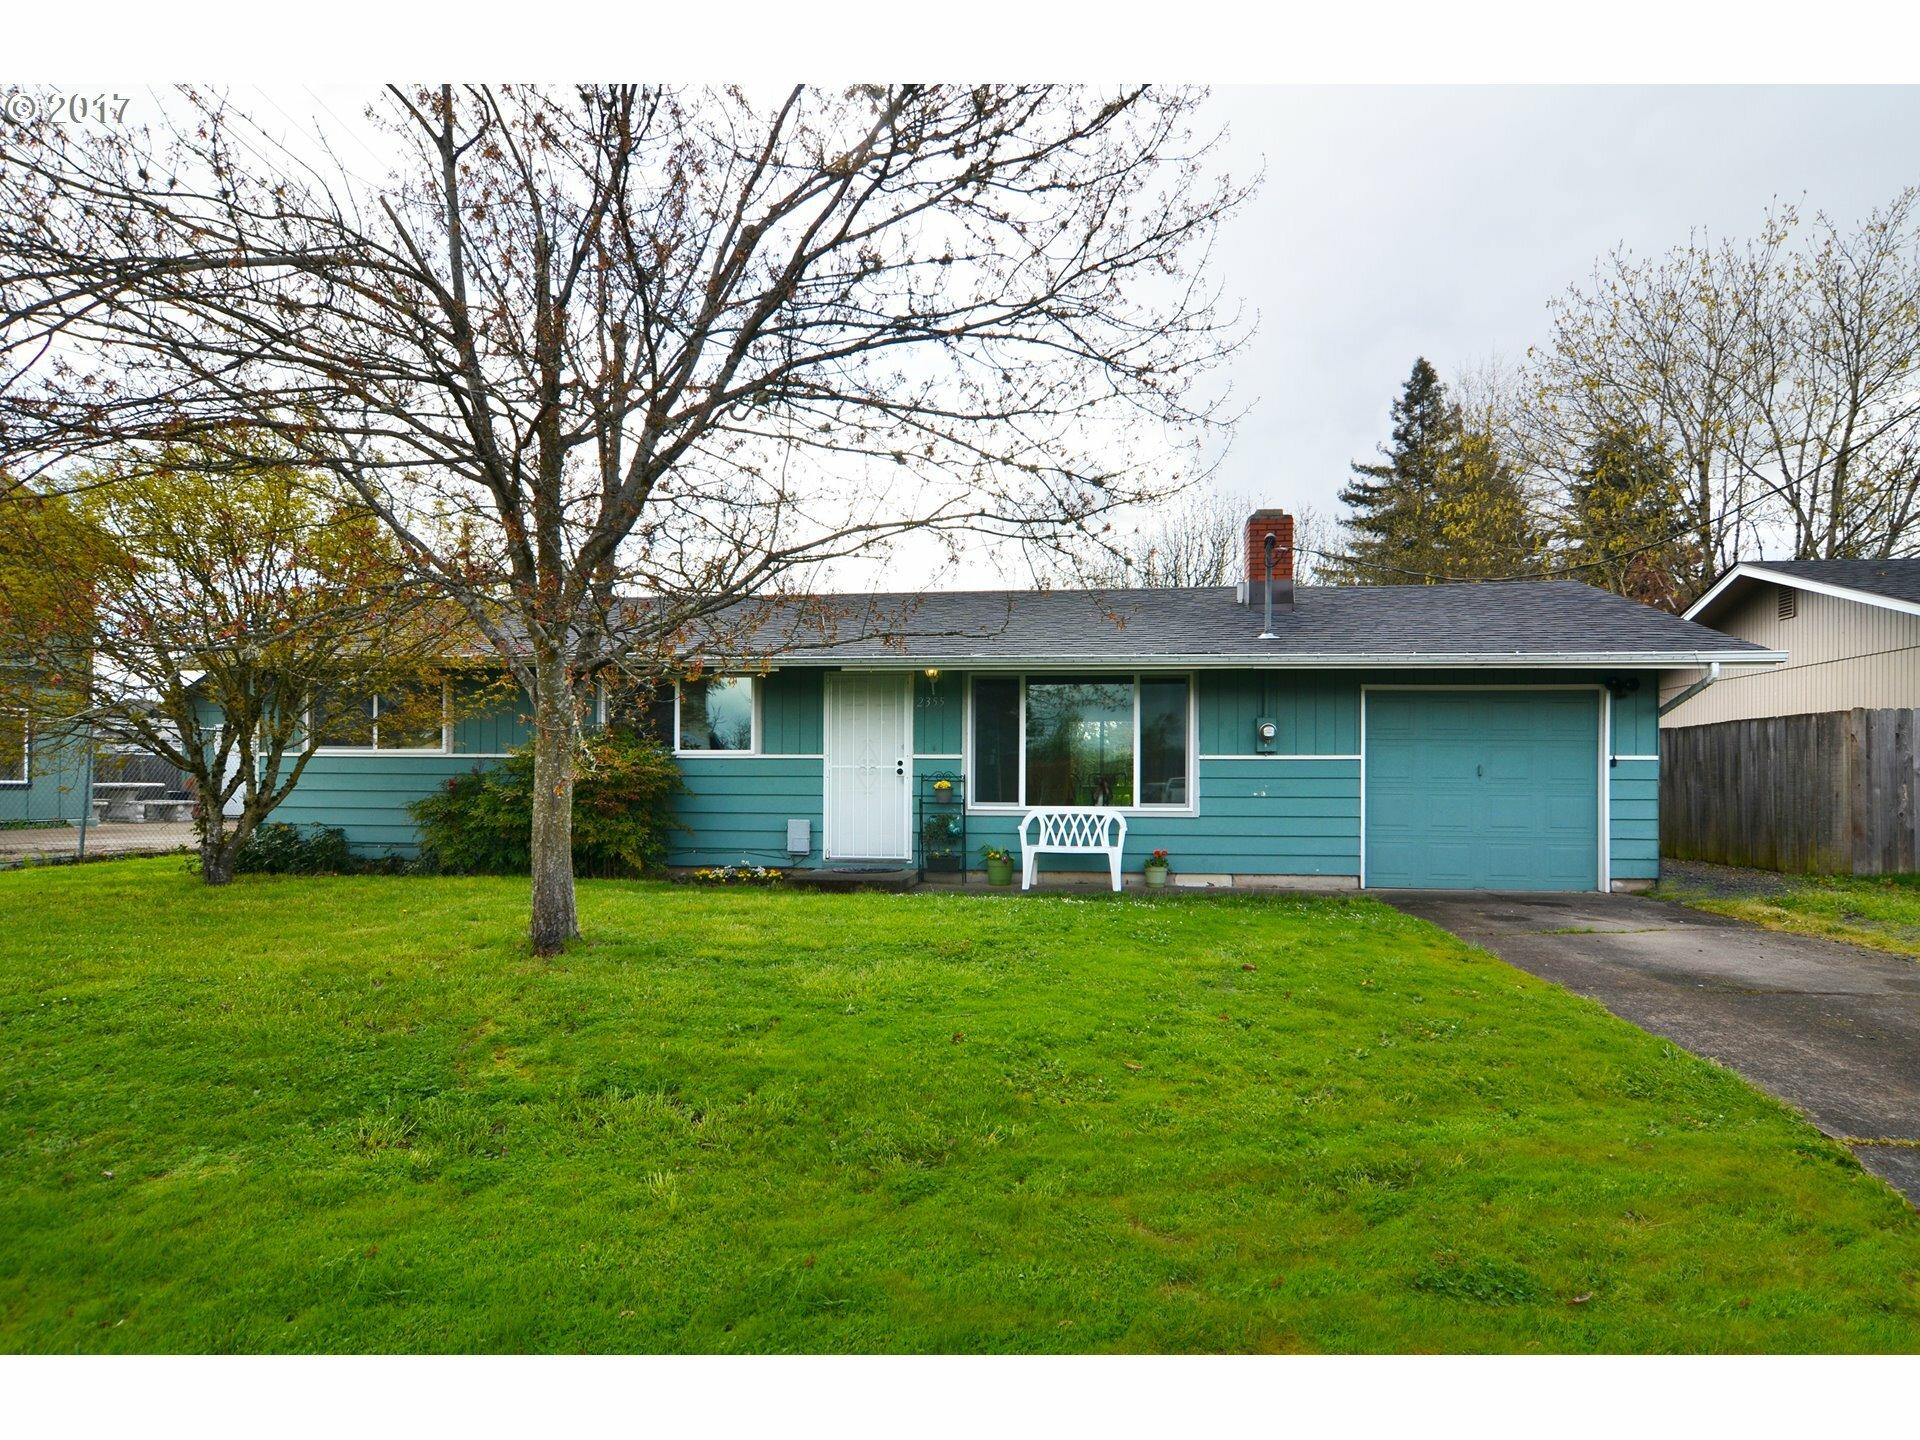 2355 Compton St, Eugene, OR - USA (photo 2)